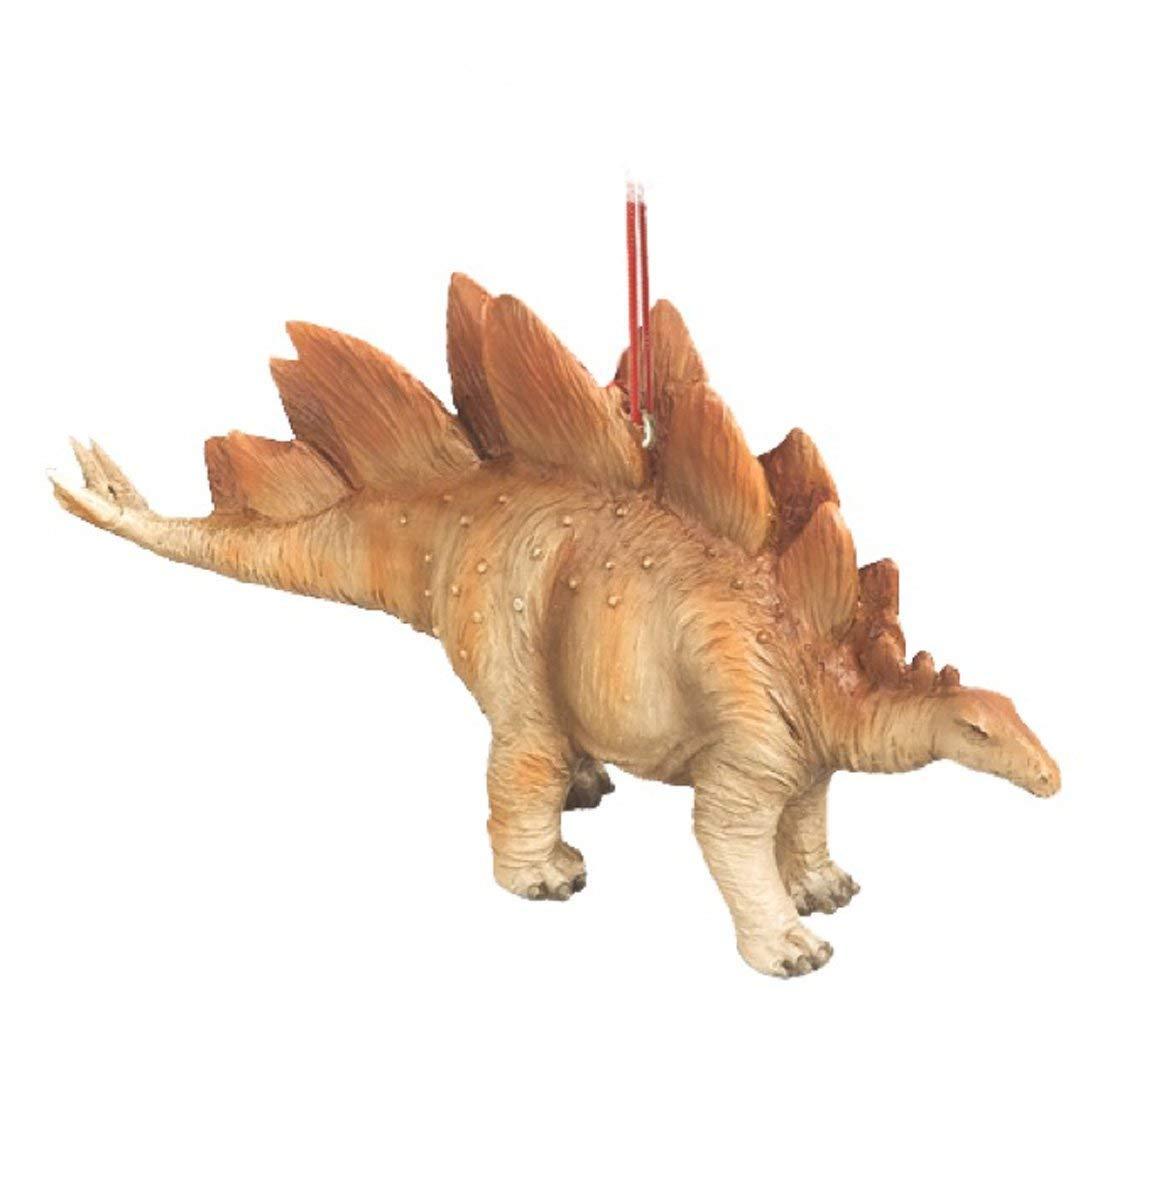 Stegosaurus Jurassic Dinosaur Resin Stone Christmas Tree Ornament Midwest-CBK